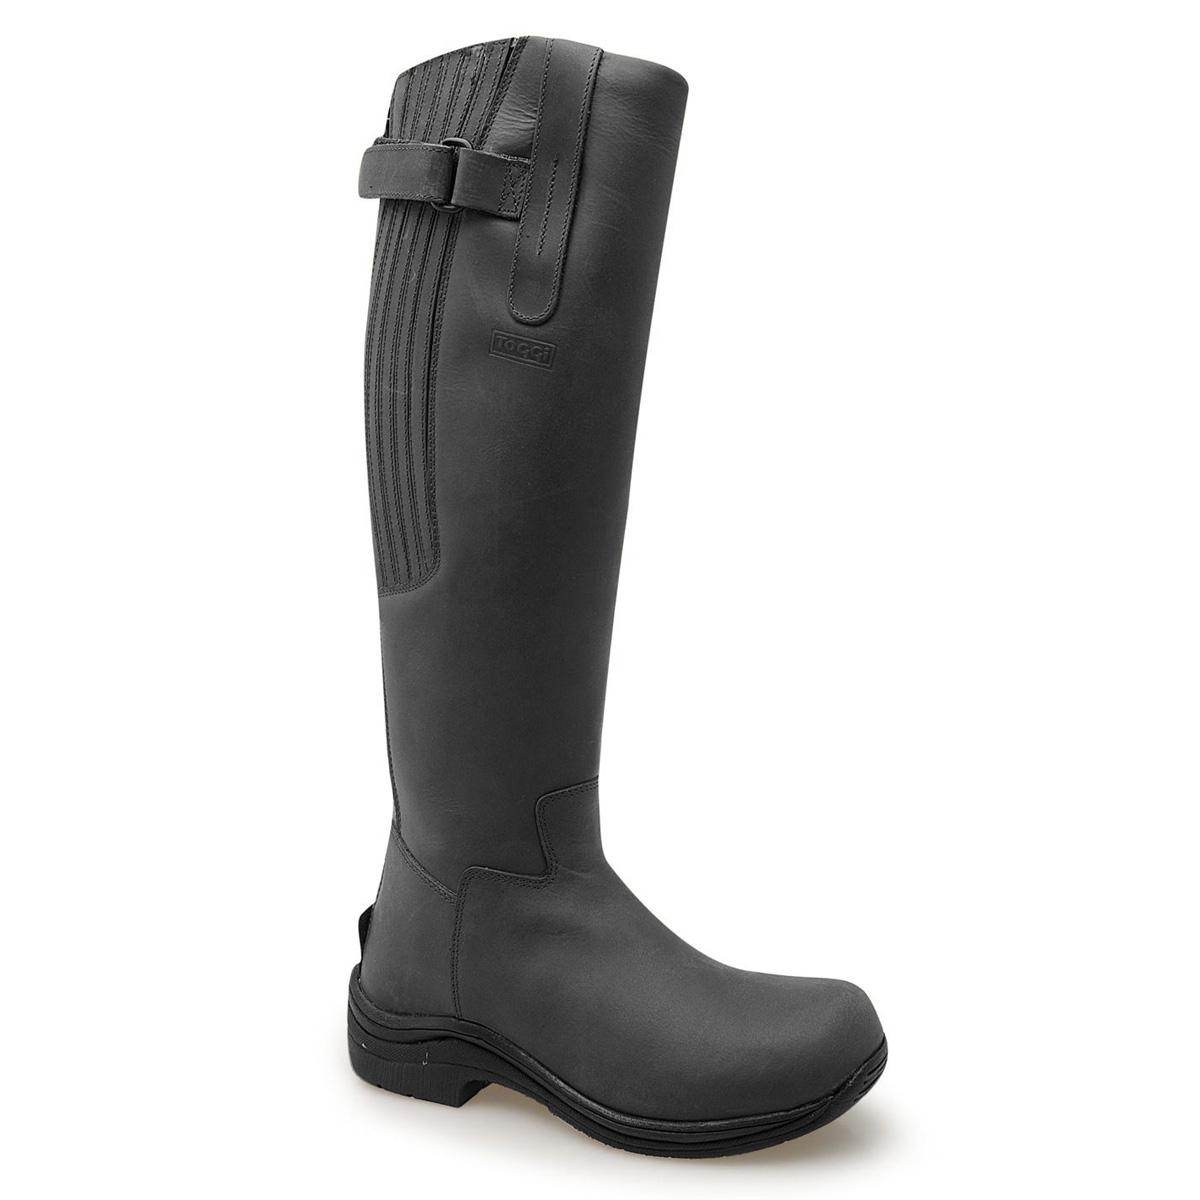 Toggi Calgary Riding Boots (Womens) - Black | Uttings.co.uk